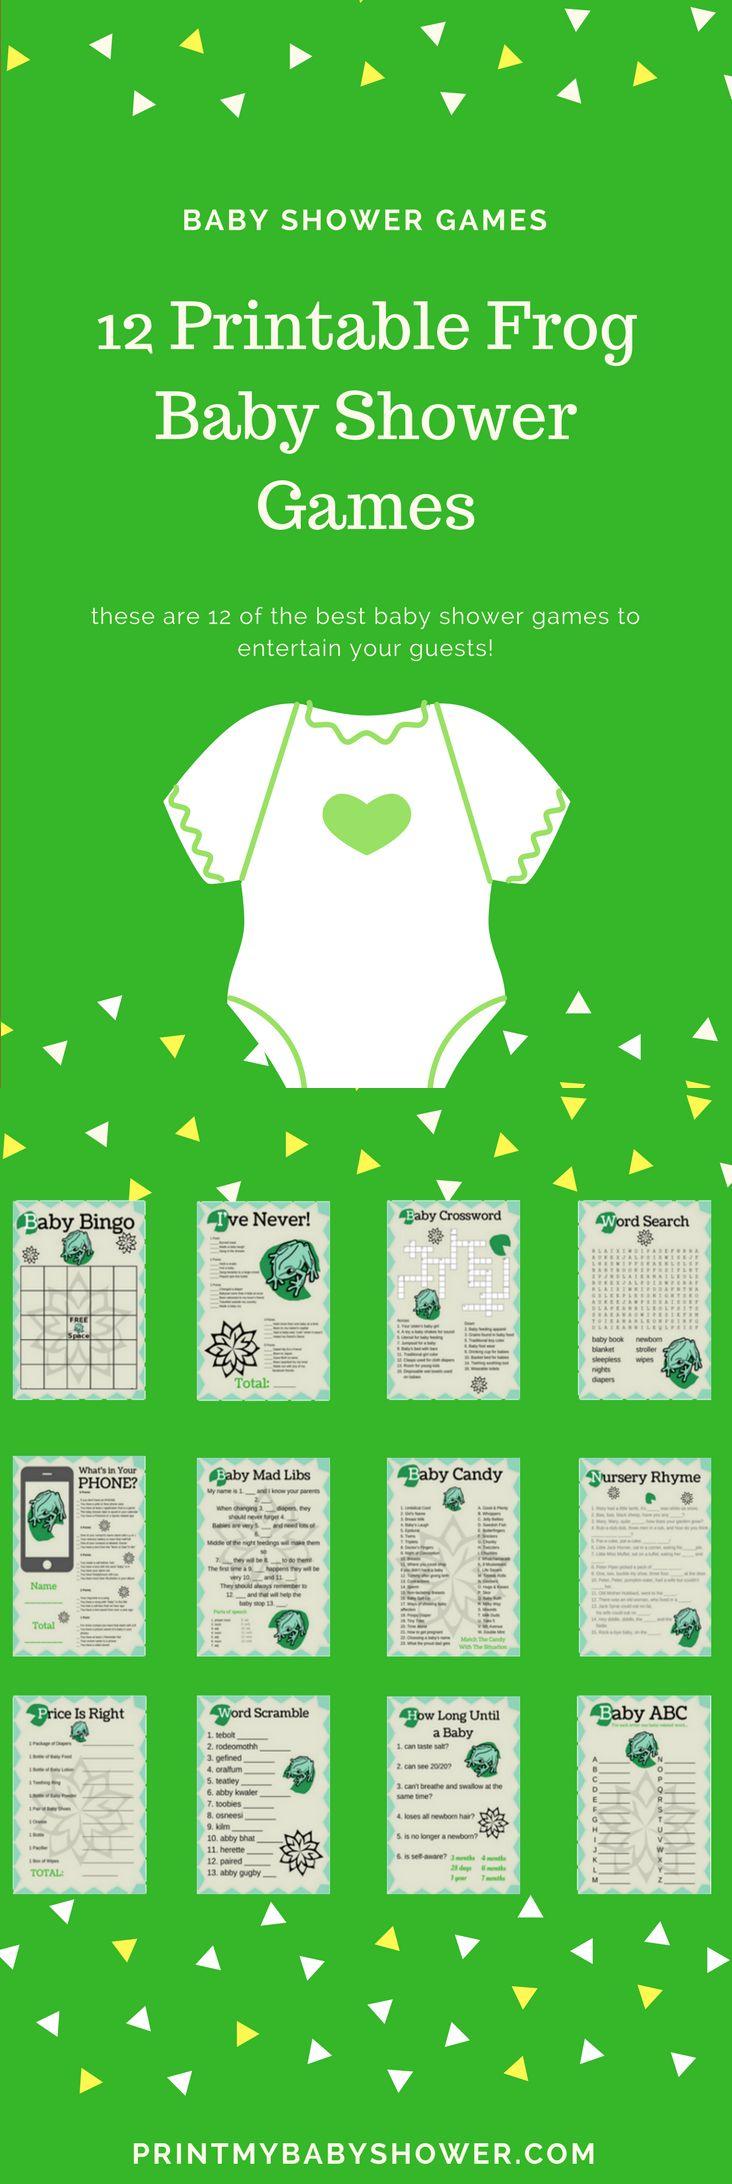 printable baby shower games | printable baby shower games for boys | printable baby shower games templates | frog baby shower theme |frog baby shower ideas